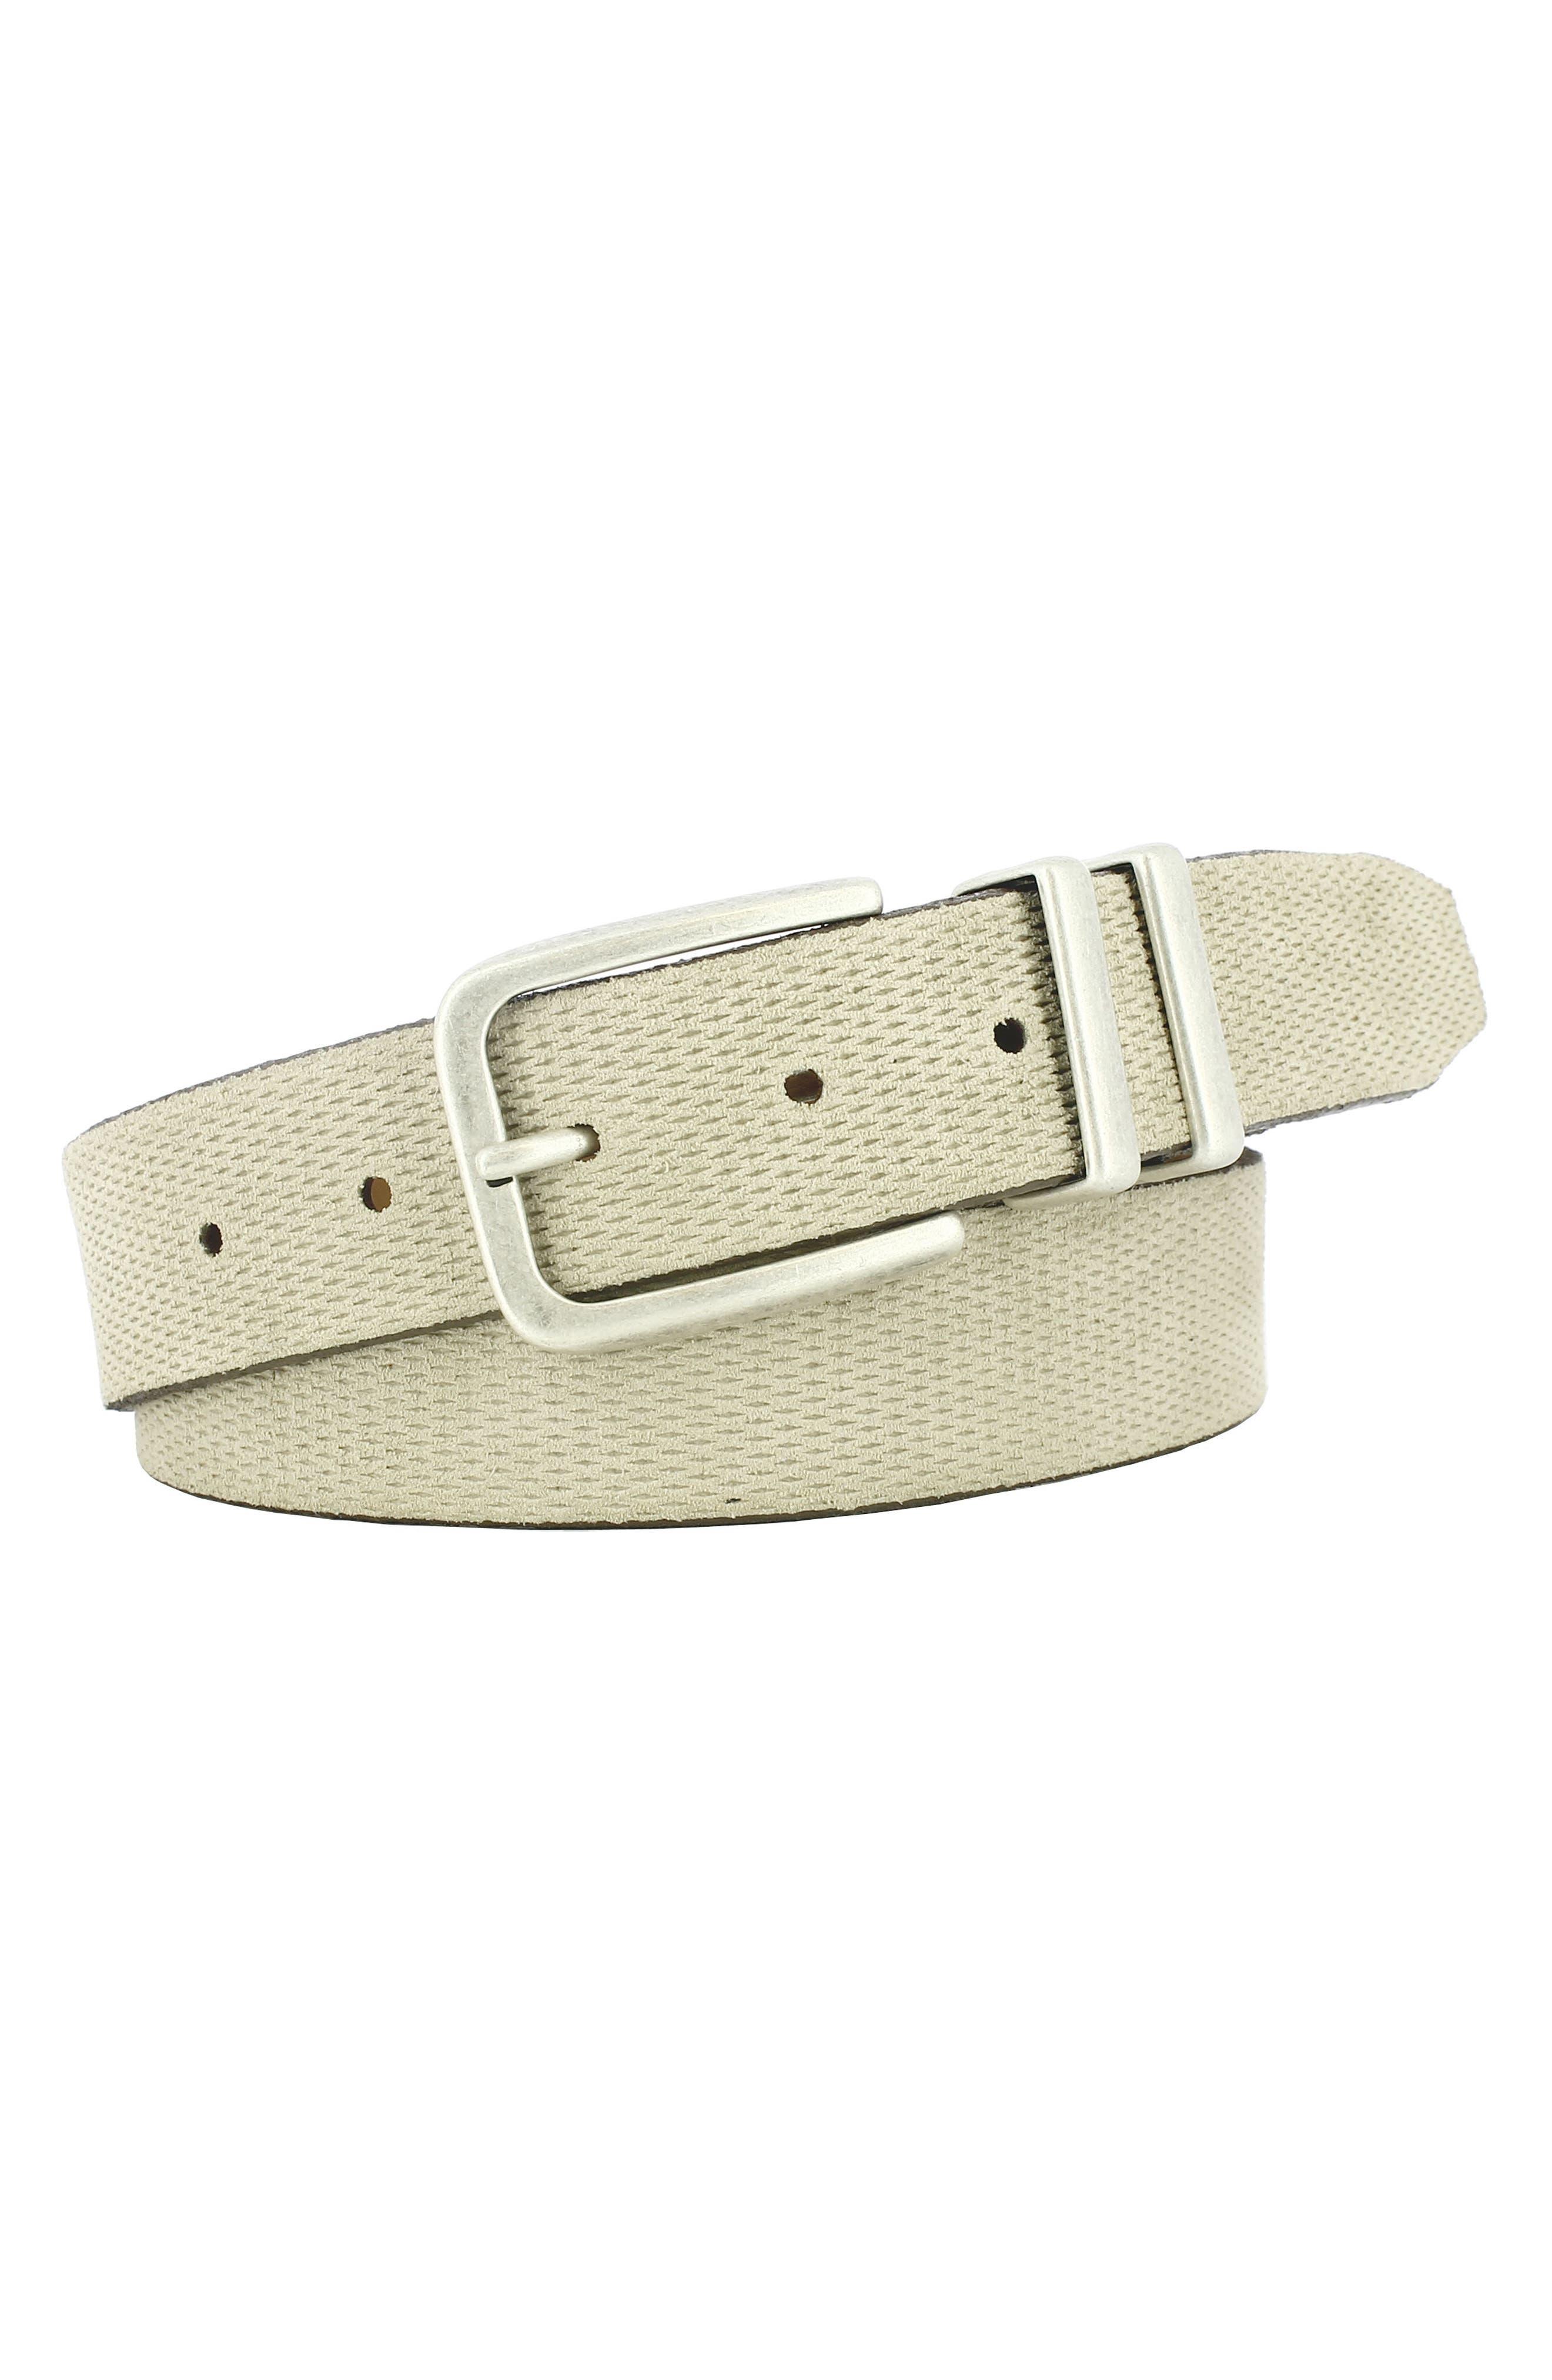 Remo Tulliani Axel Textured Leather Belt